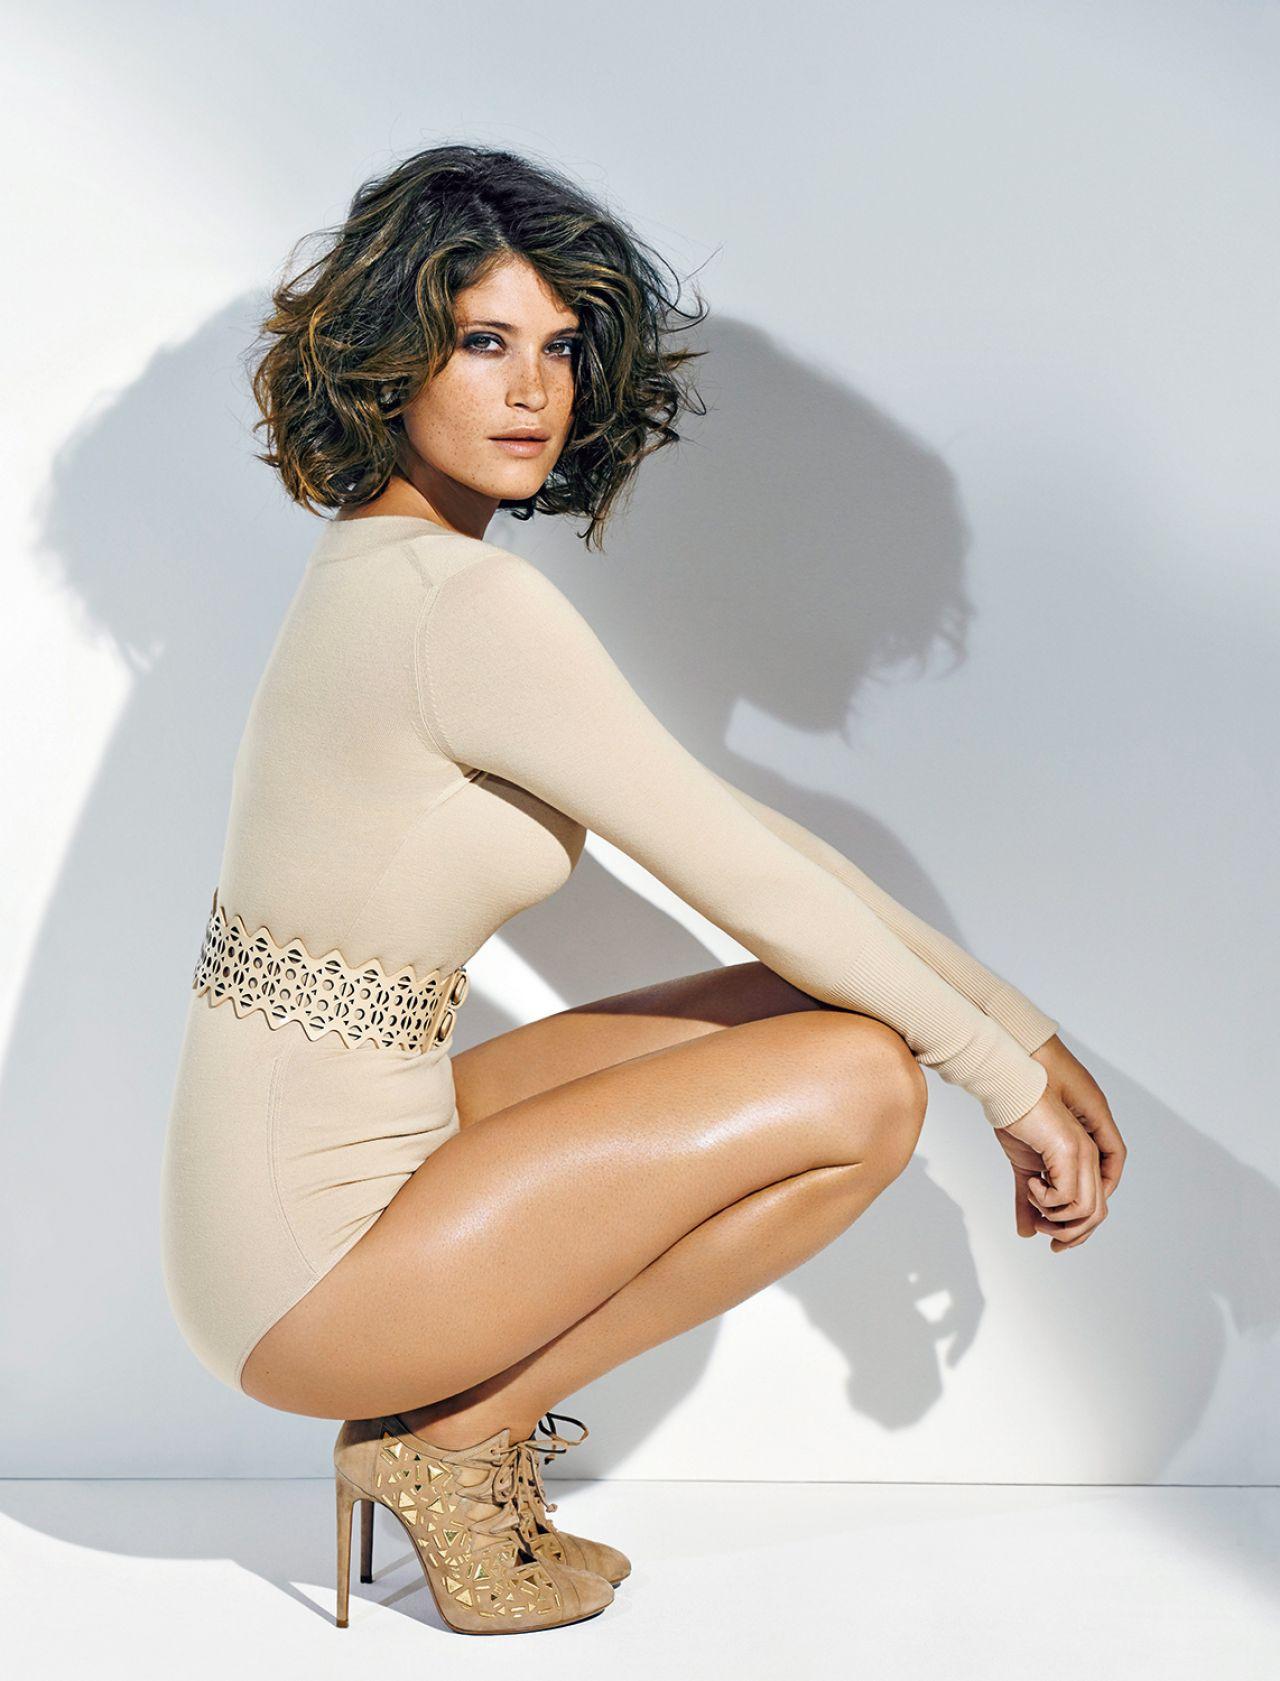 Gemma Arterton Photoshoot For Madame Figaro Magazine